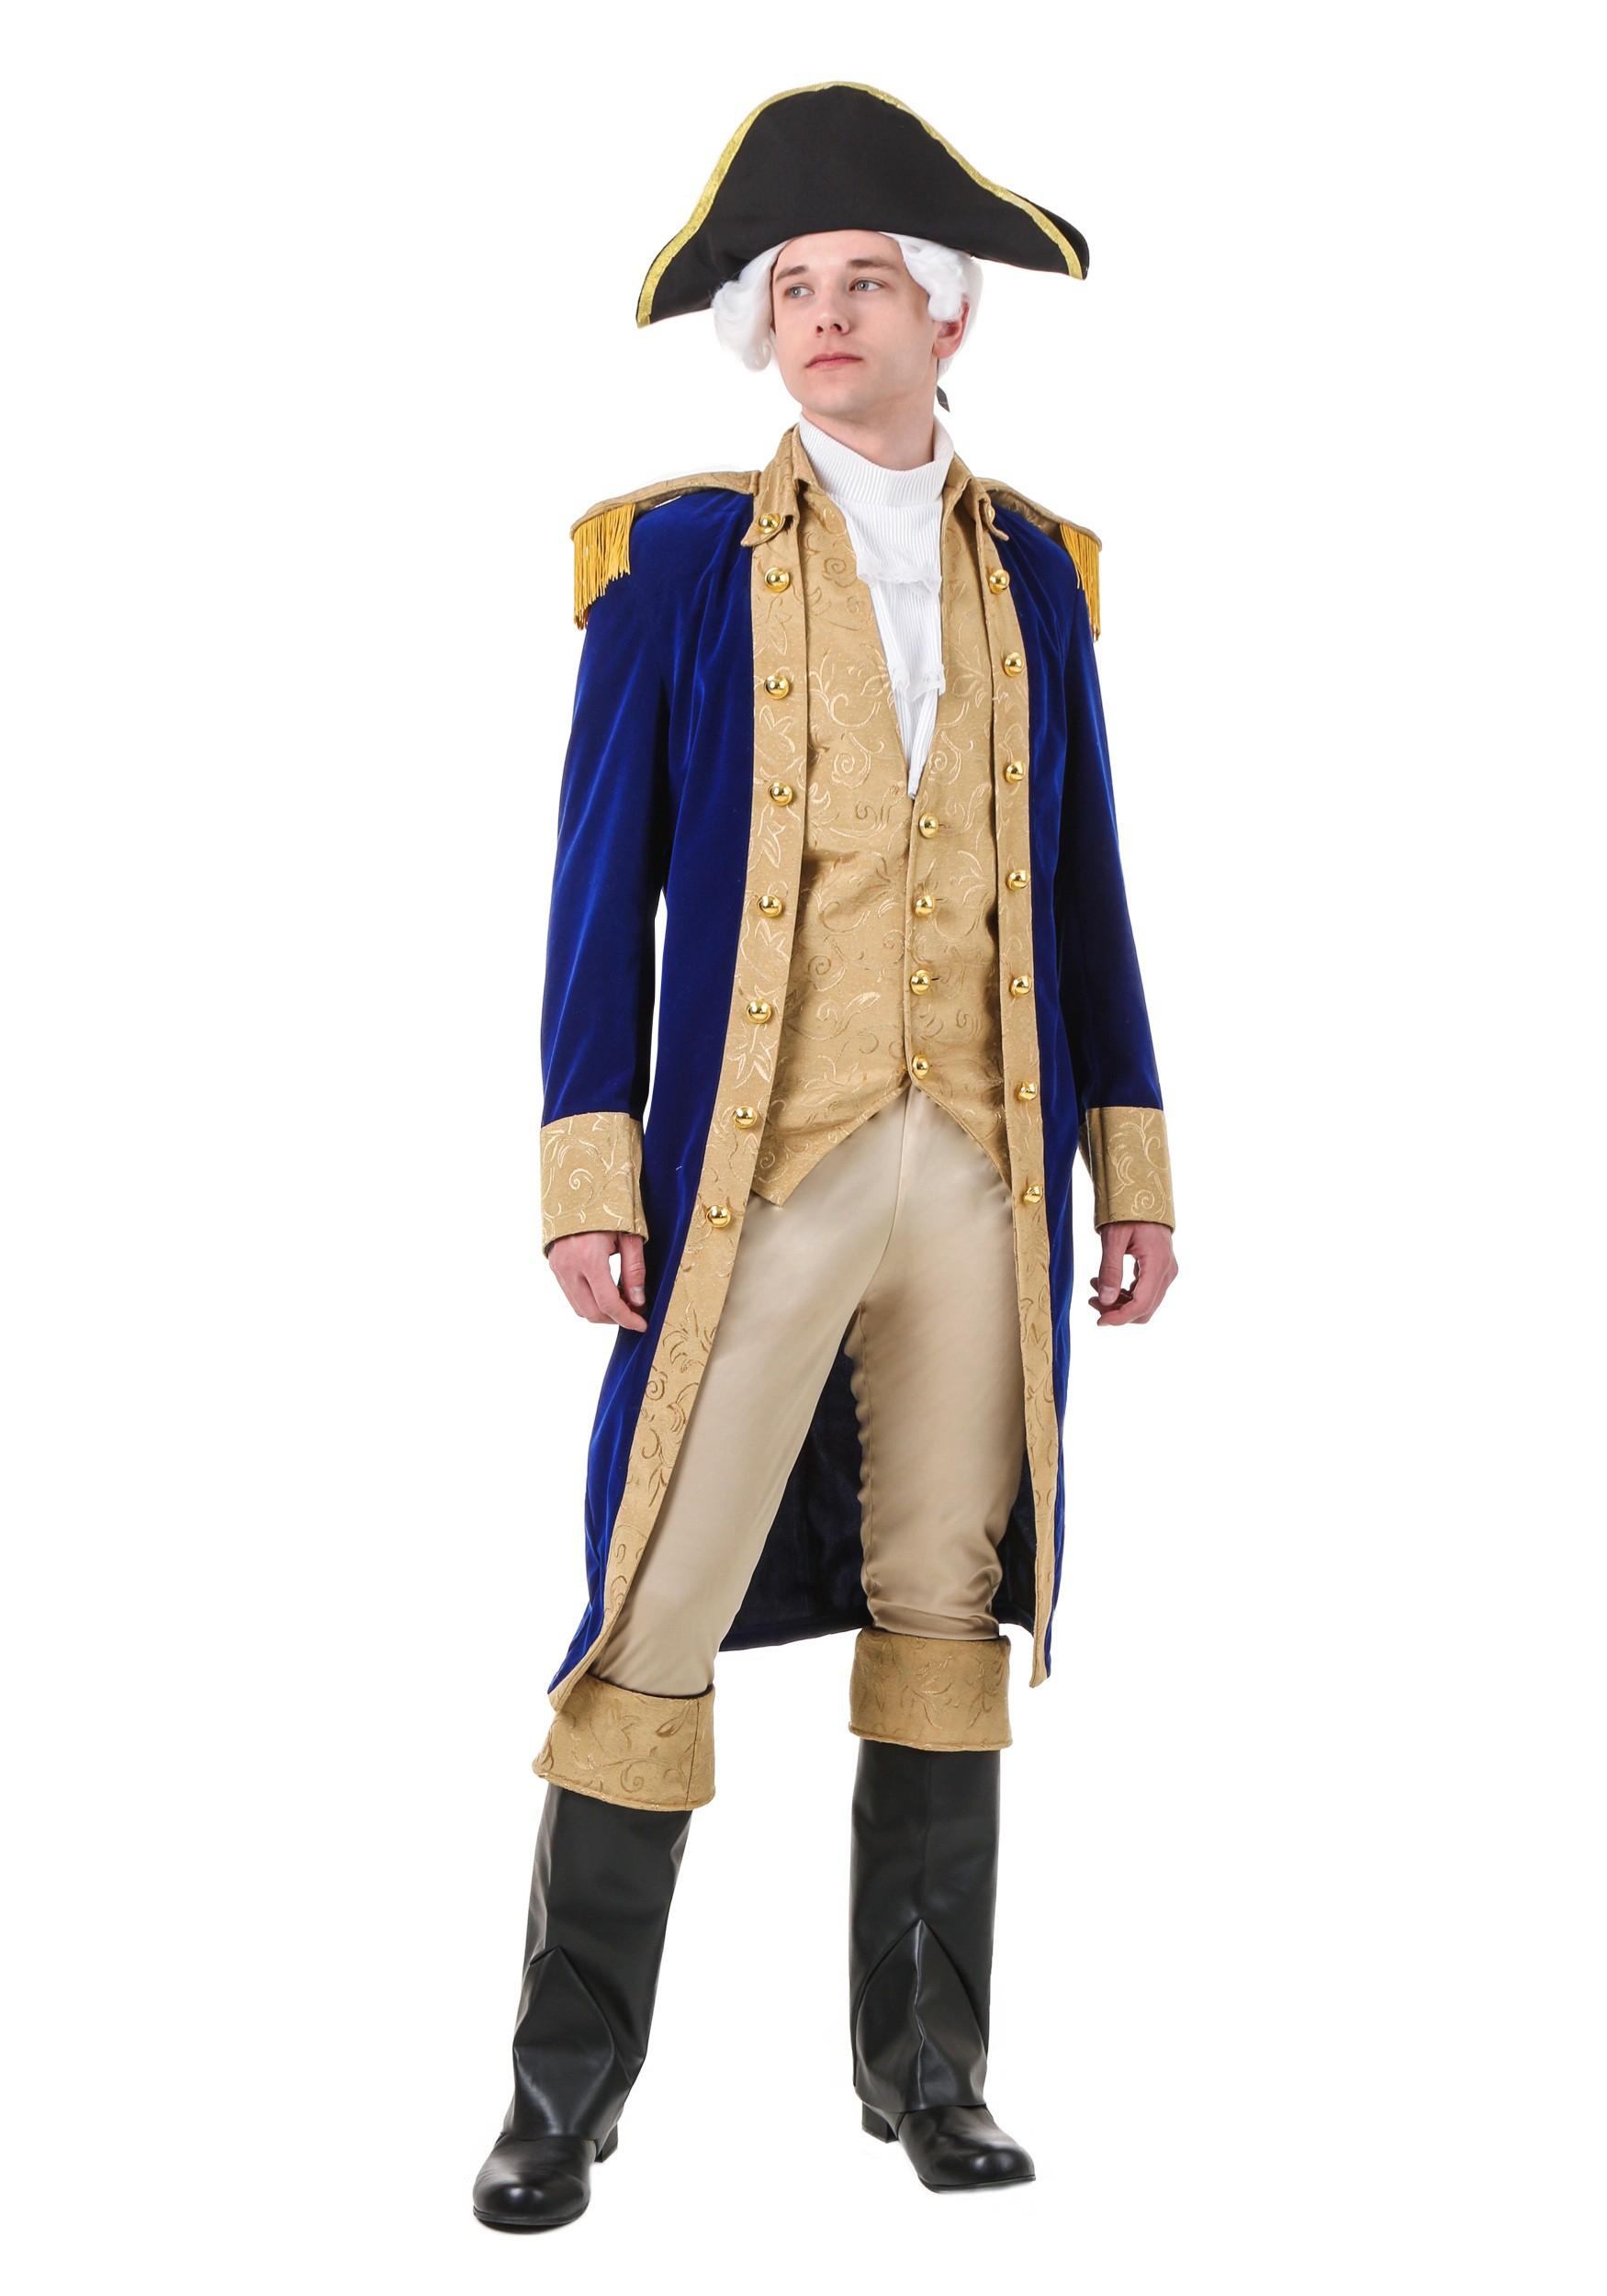 George Washington Costume for Adults | Historical Costume